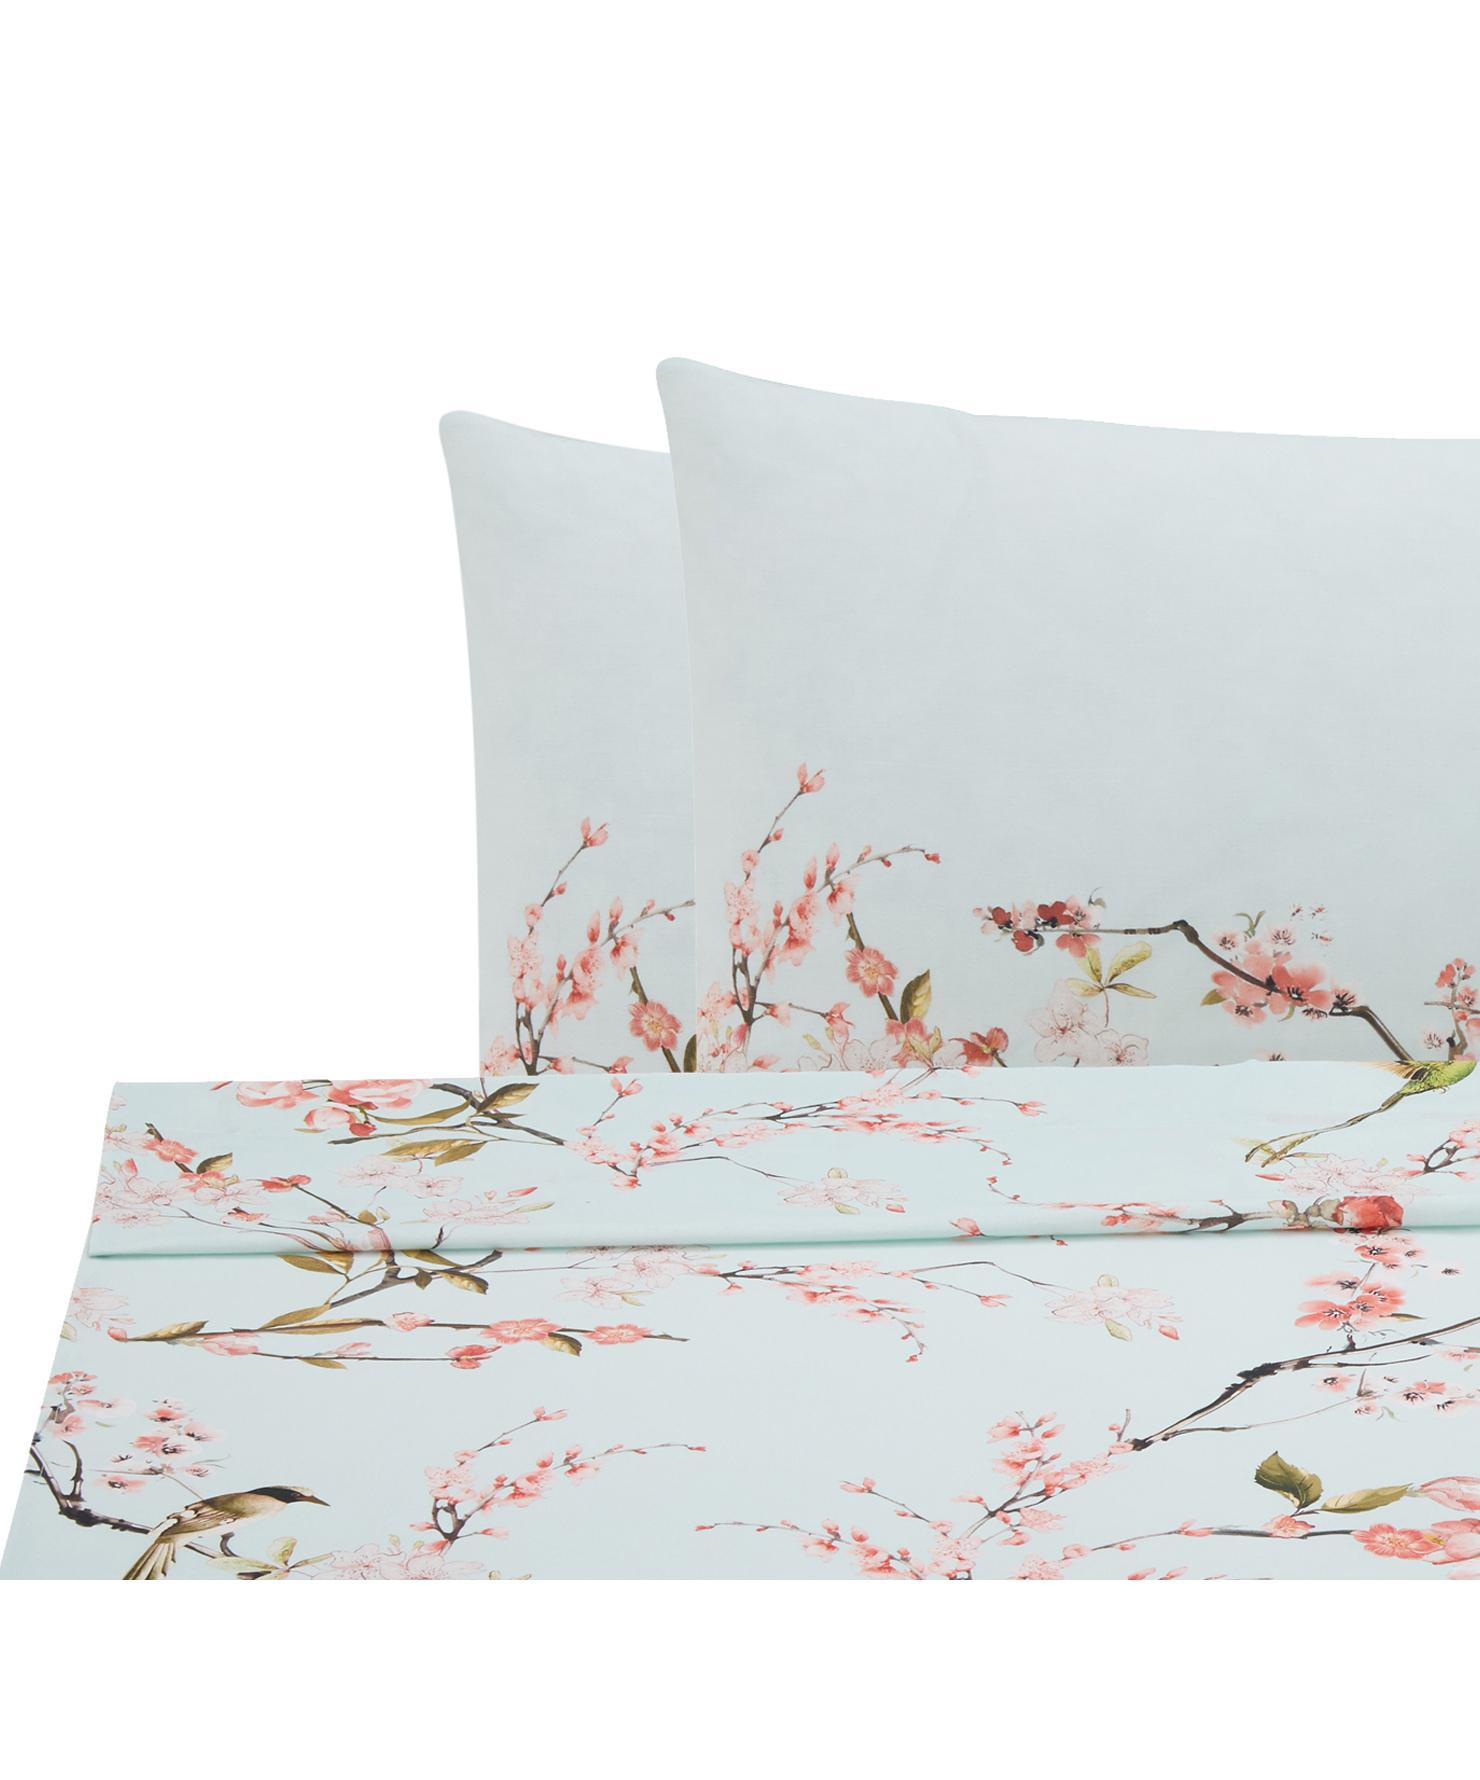 Set lenzuola in cotone ranforce Chinoiserie 3 pz, Tessuto: Renforcé, Verde, rosa, 240 x 270 cm